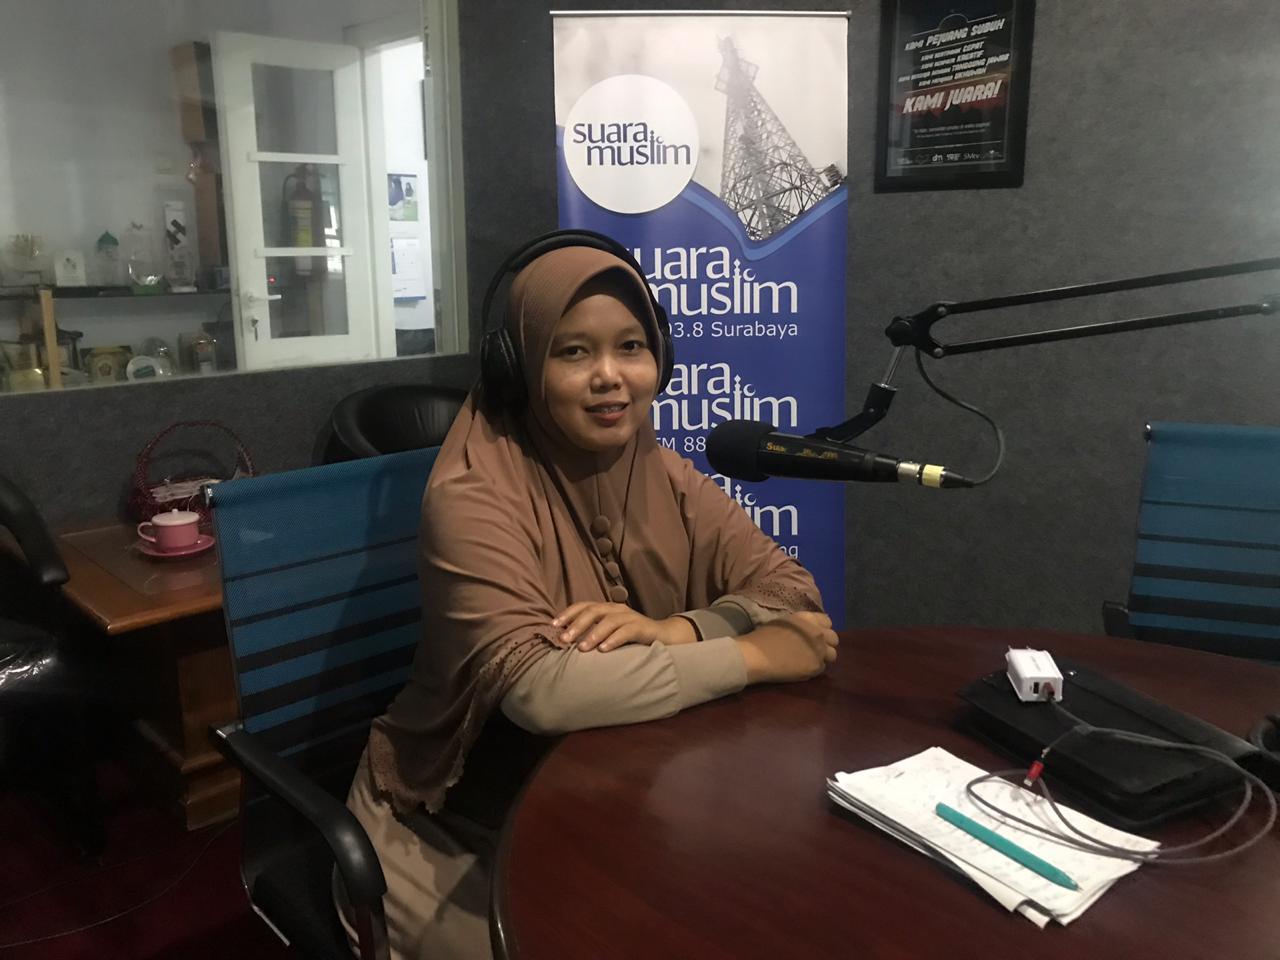 Nur Elya Anggraini, Koordinator Divisi Humas dan Hubungan Antar Lembaga Bawaslu Provinsi Jatim dalam talkshow Ranah Publik Suara Muslim Surabaya 93.8 fm (15/4/19) .